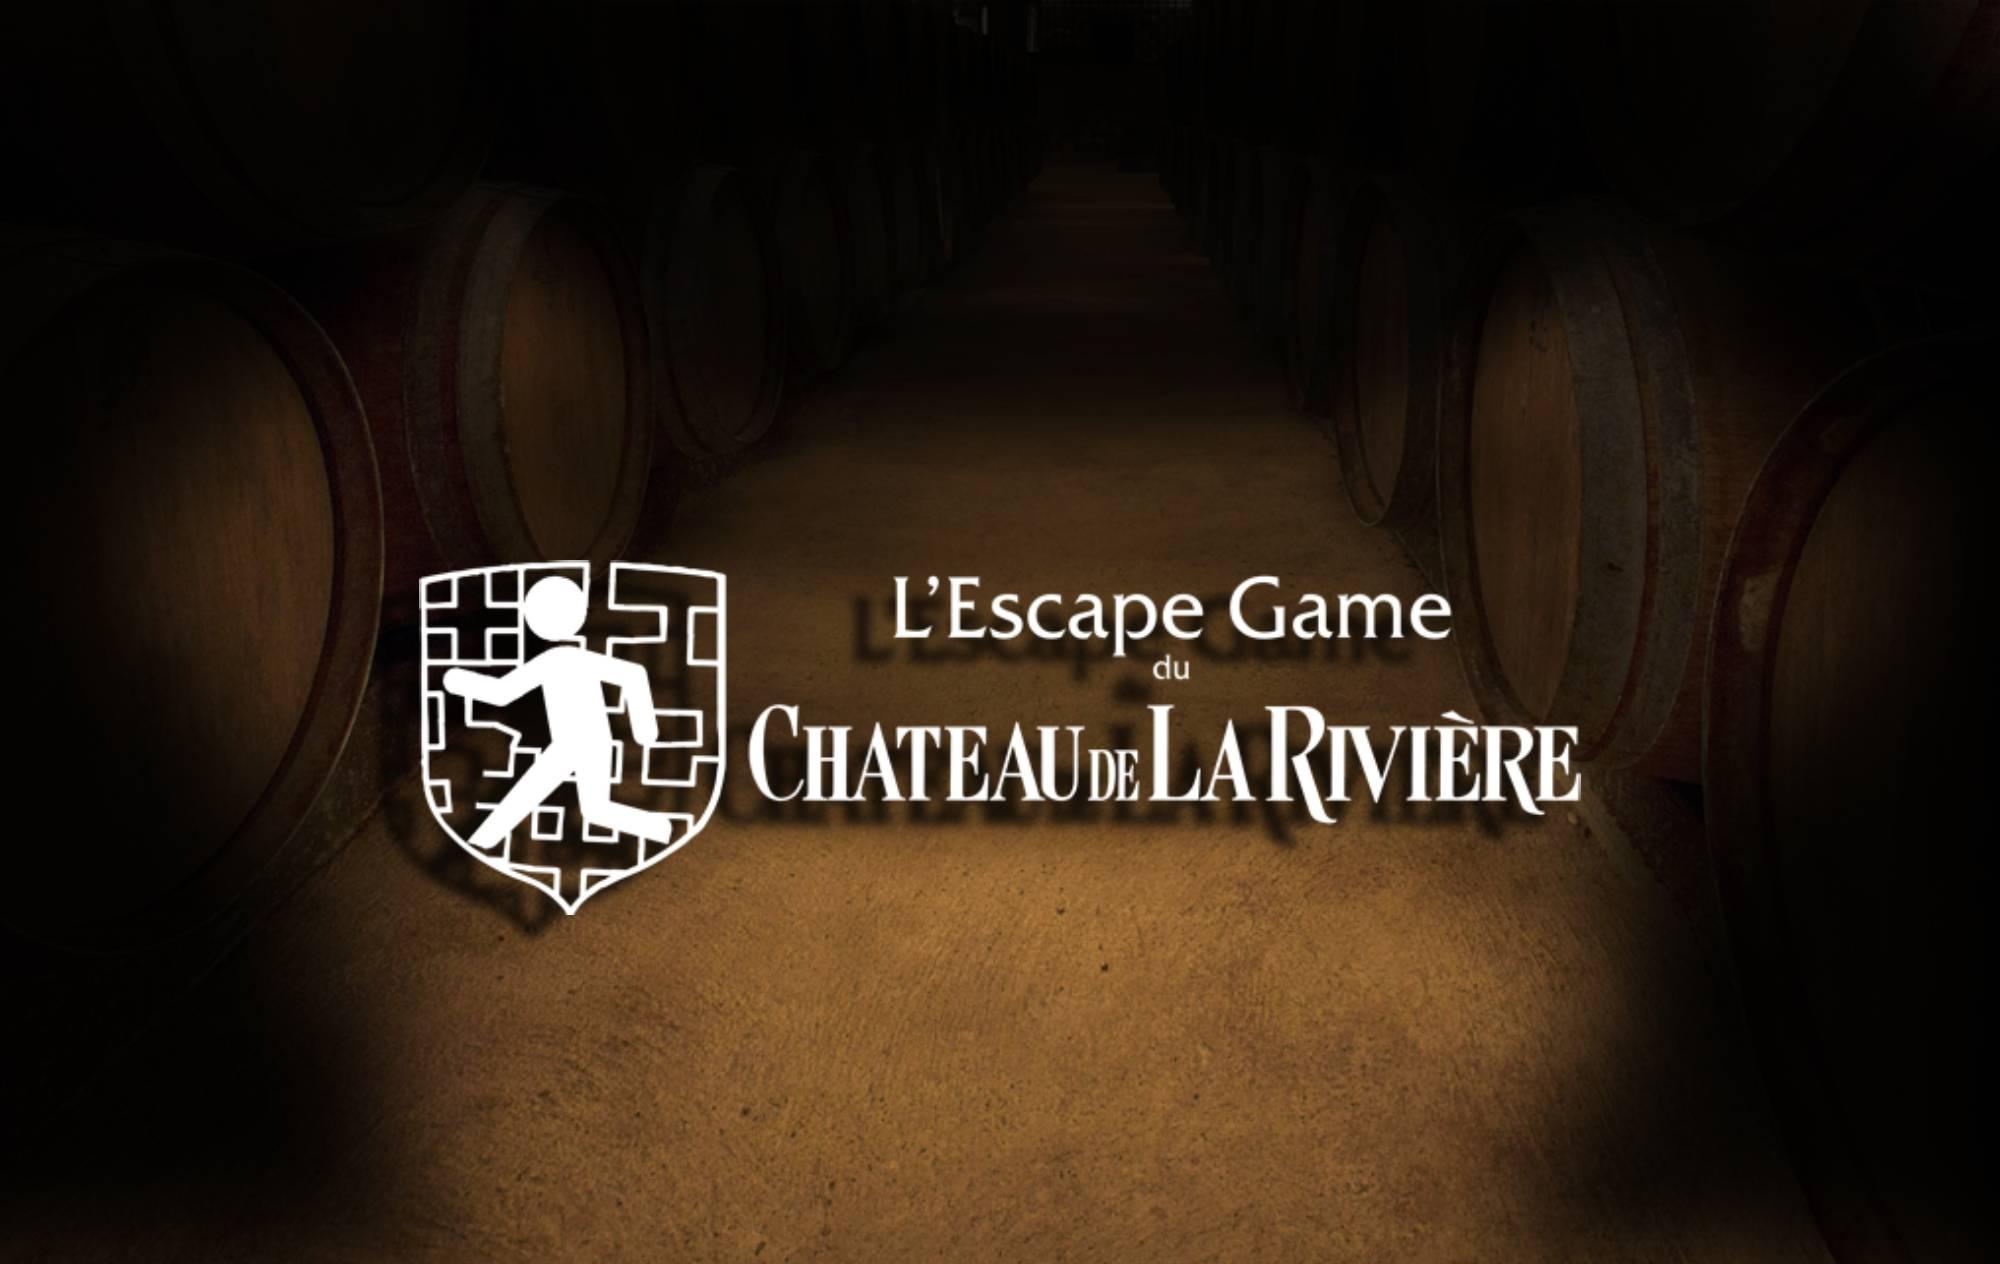 ESCAPE GAME FR